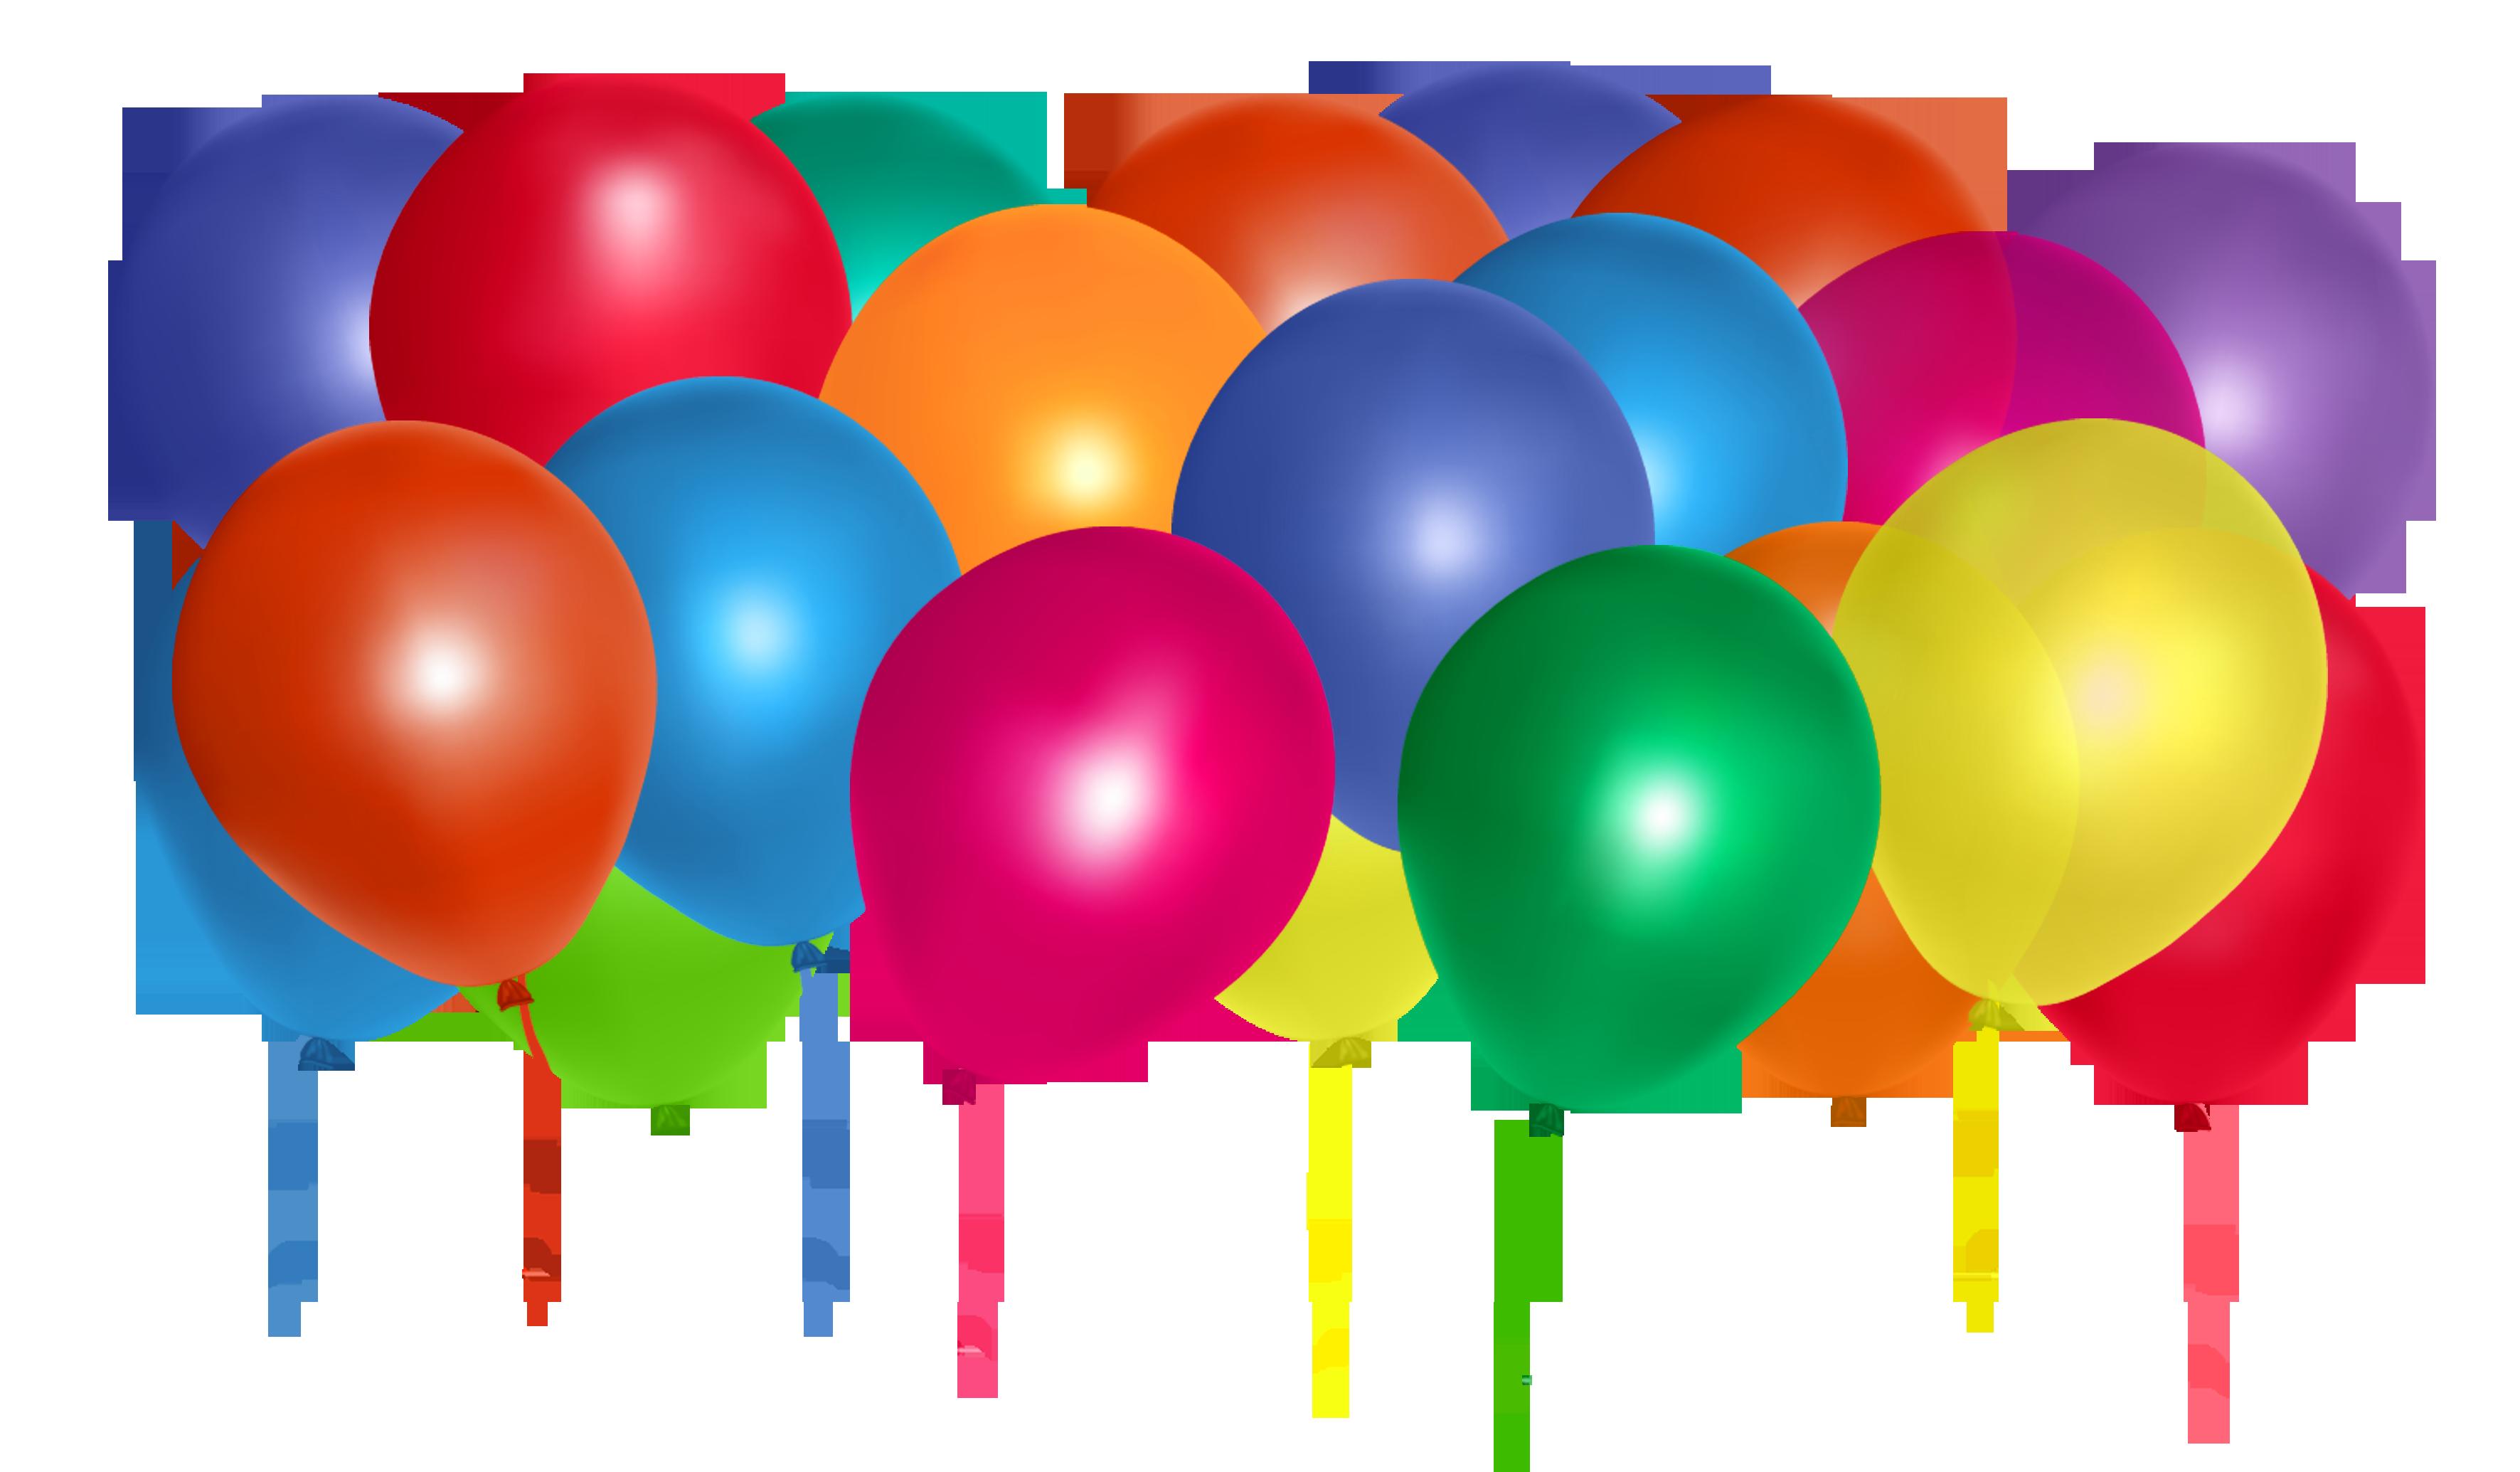 Clipart Balloons-clipart balloons-12